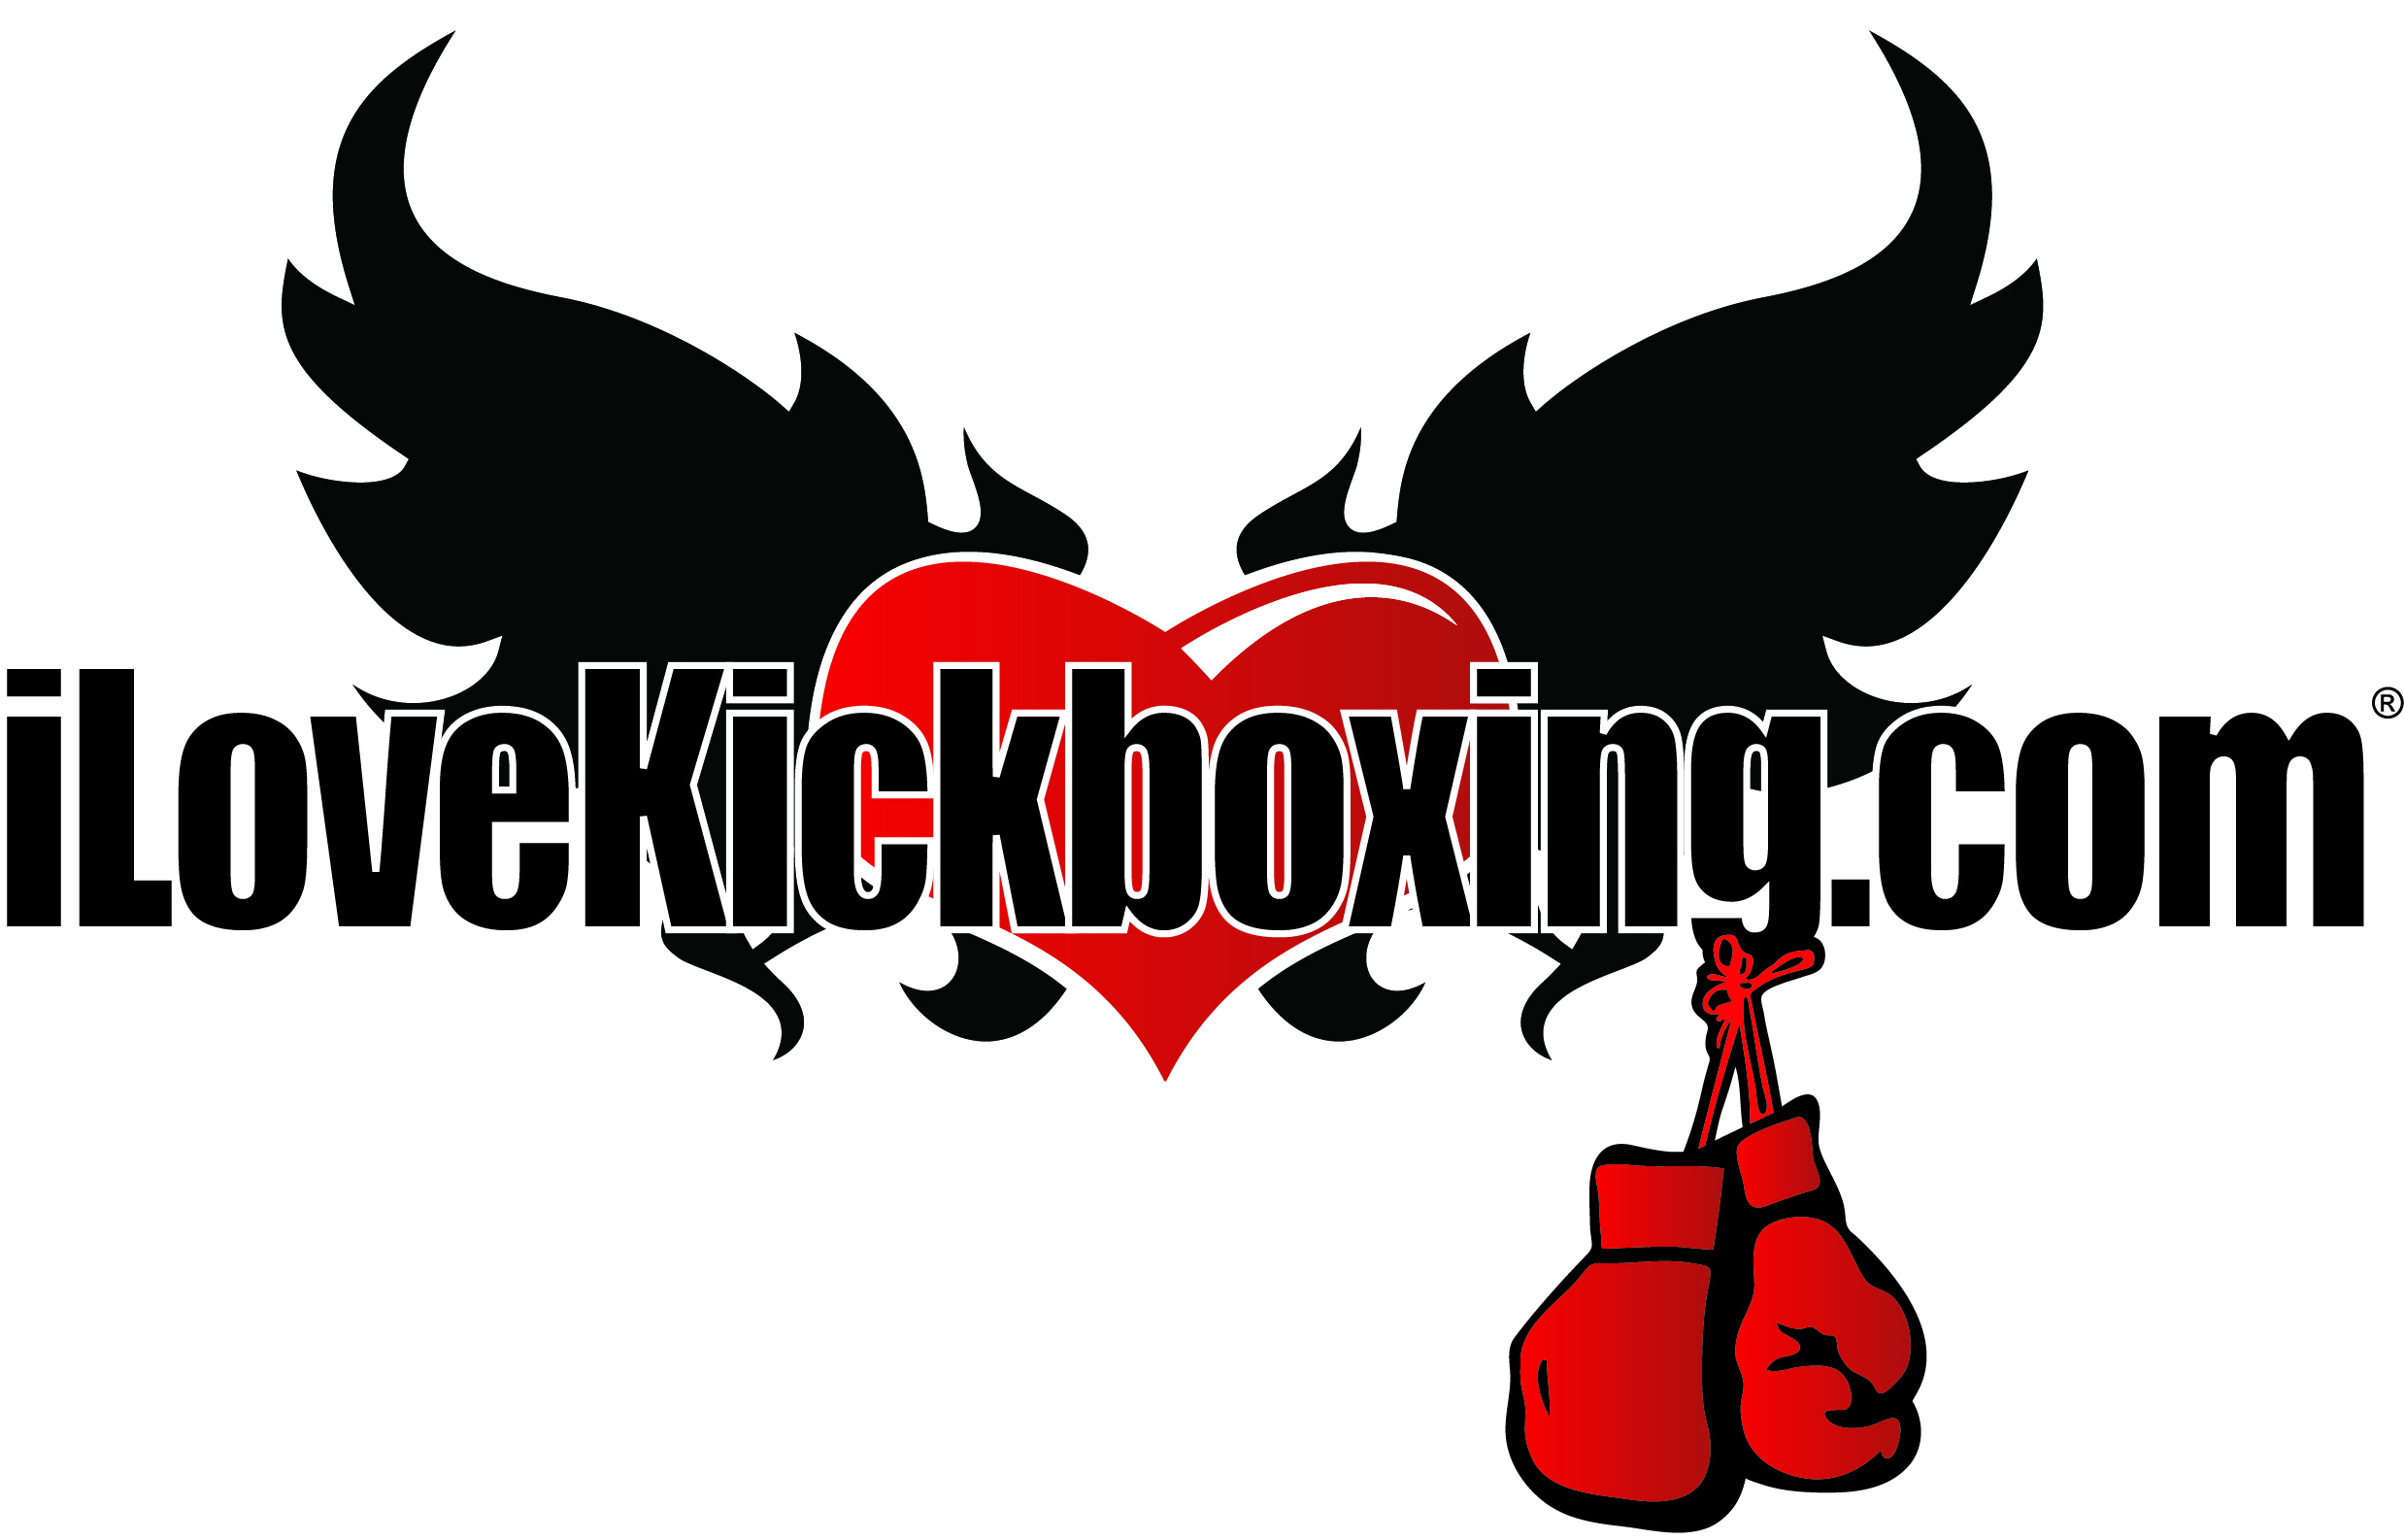 I Love Kickboxing - Pleasantville